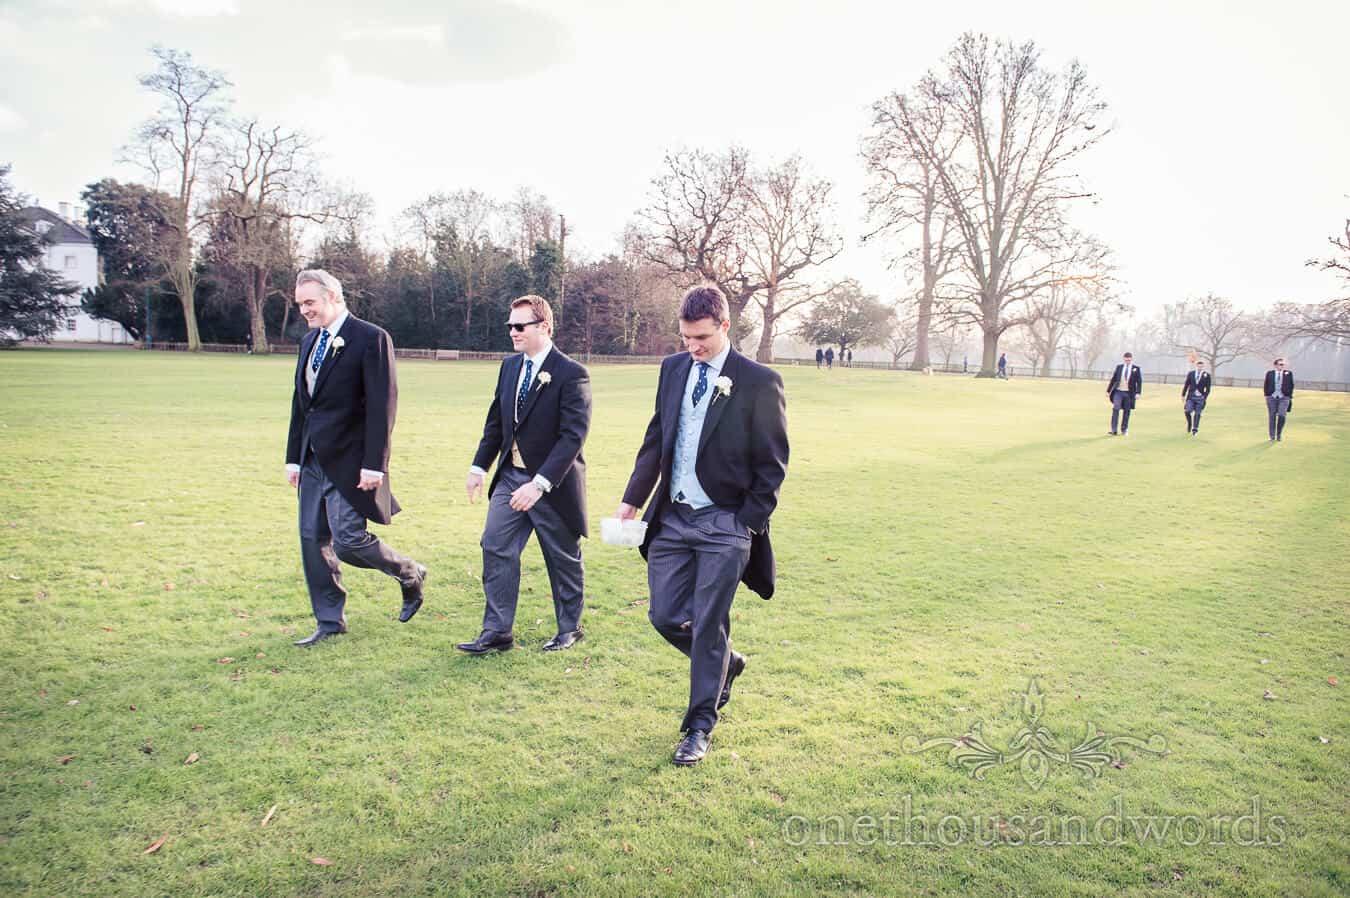 Groom walks to wedding ceremony across Richmond park